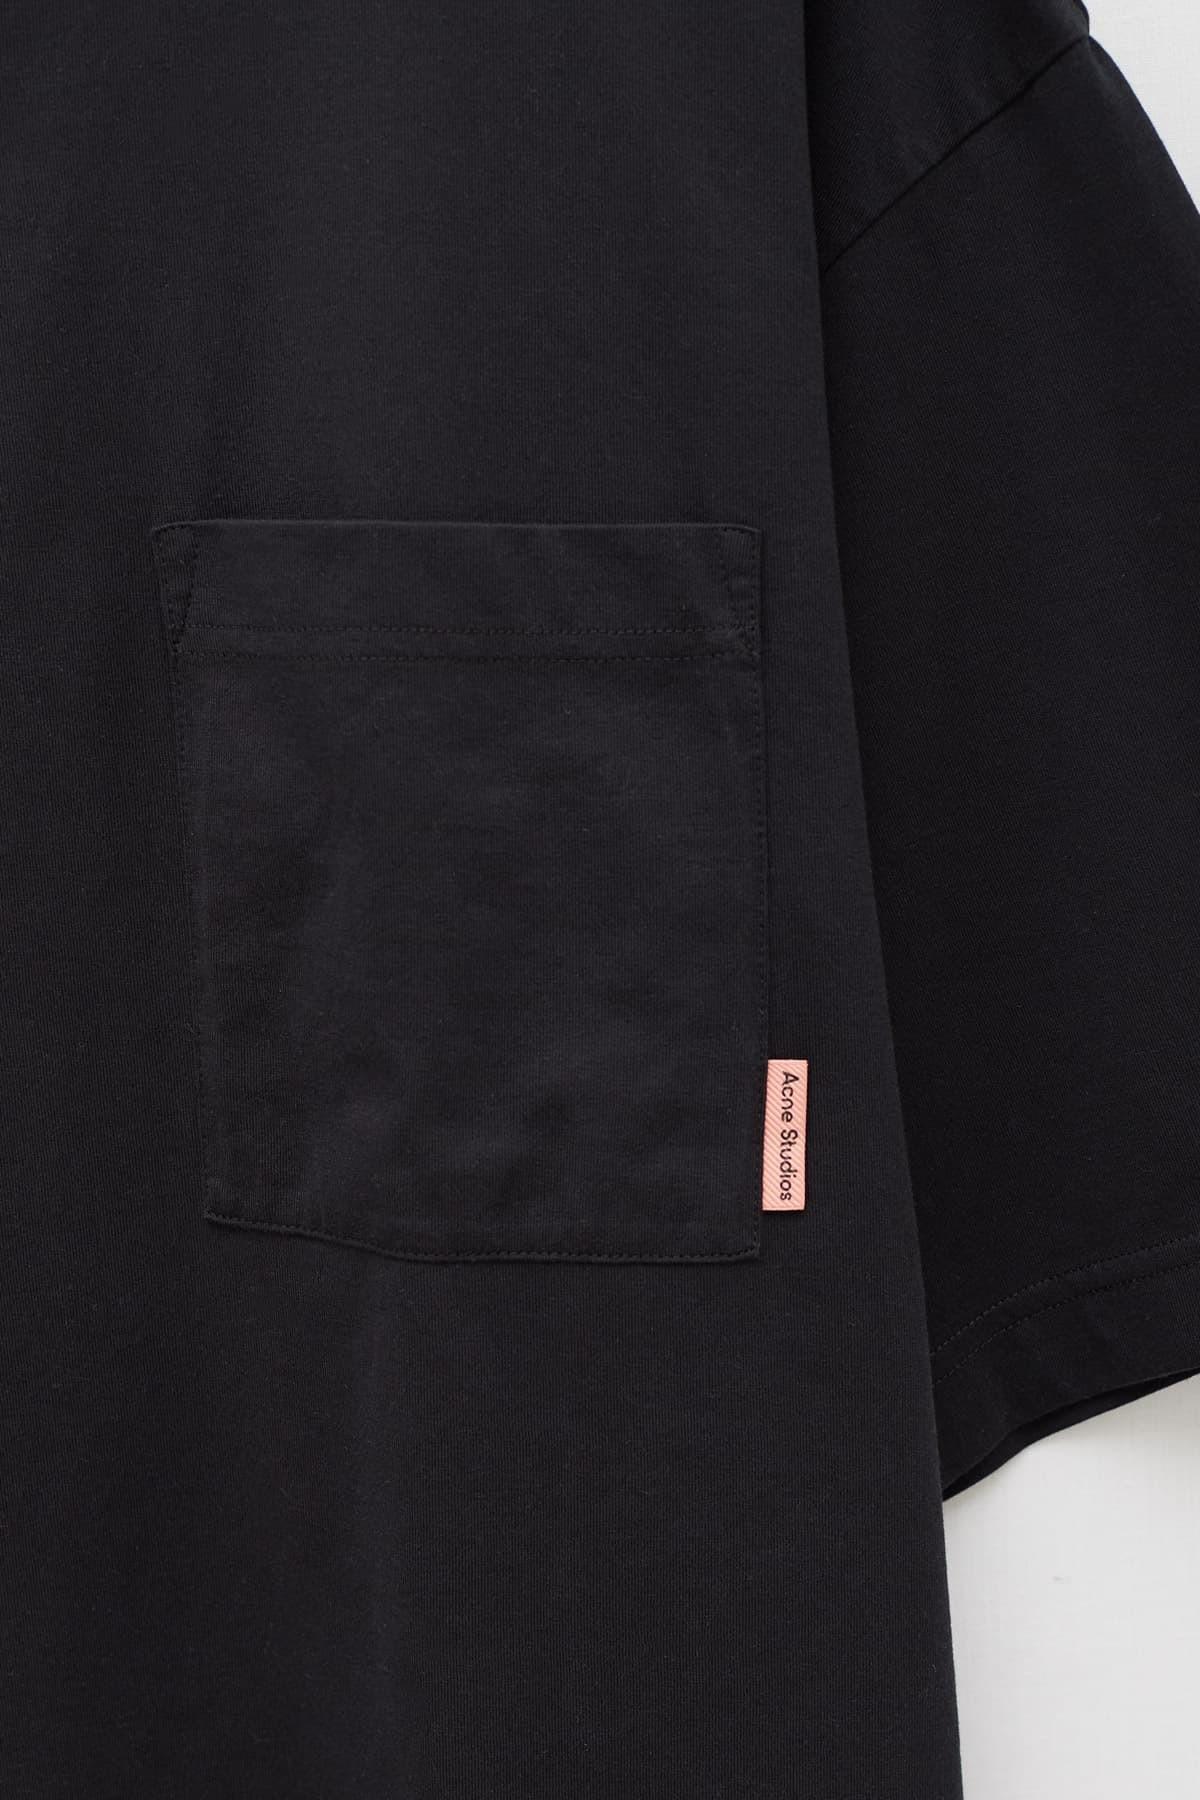 Comprar Acne Studios White Bryant Chealsea Boots